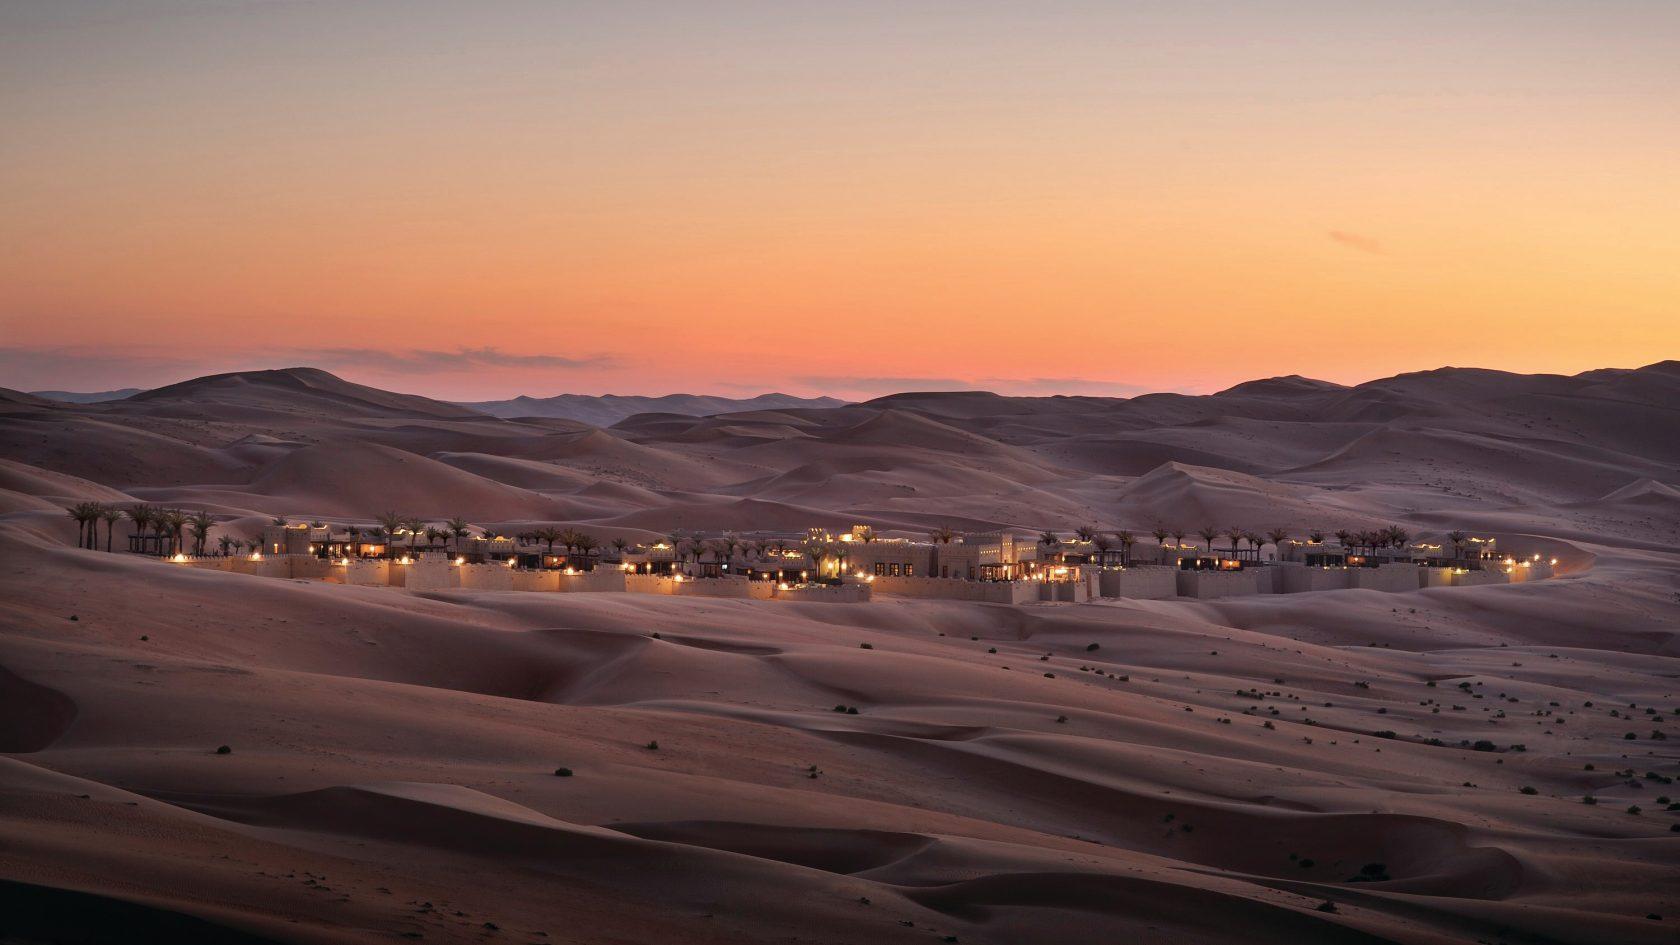 Anantara Qasr al Sarab, Abu Dhabi – Star Wars Feeling